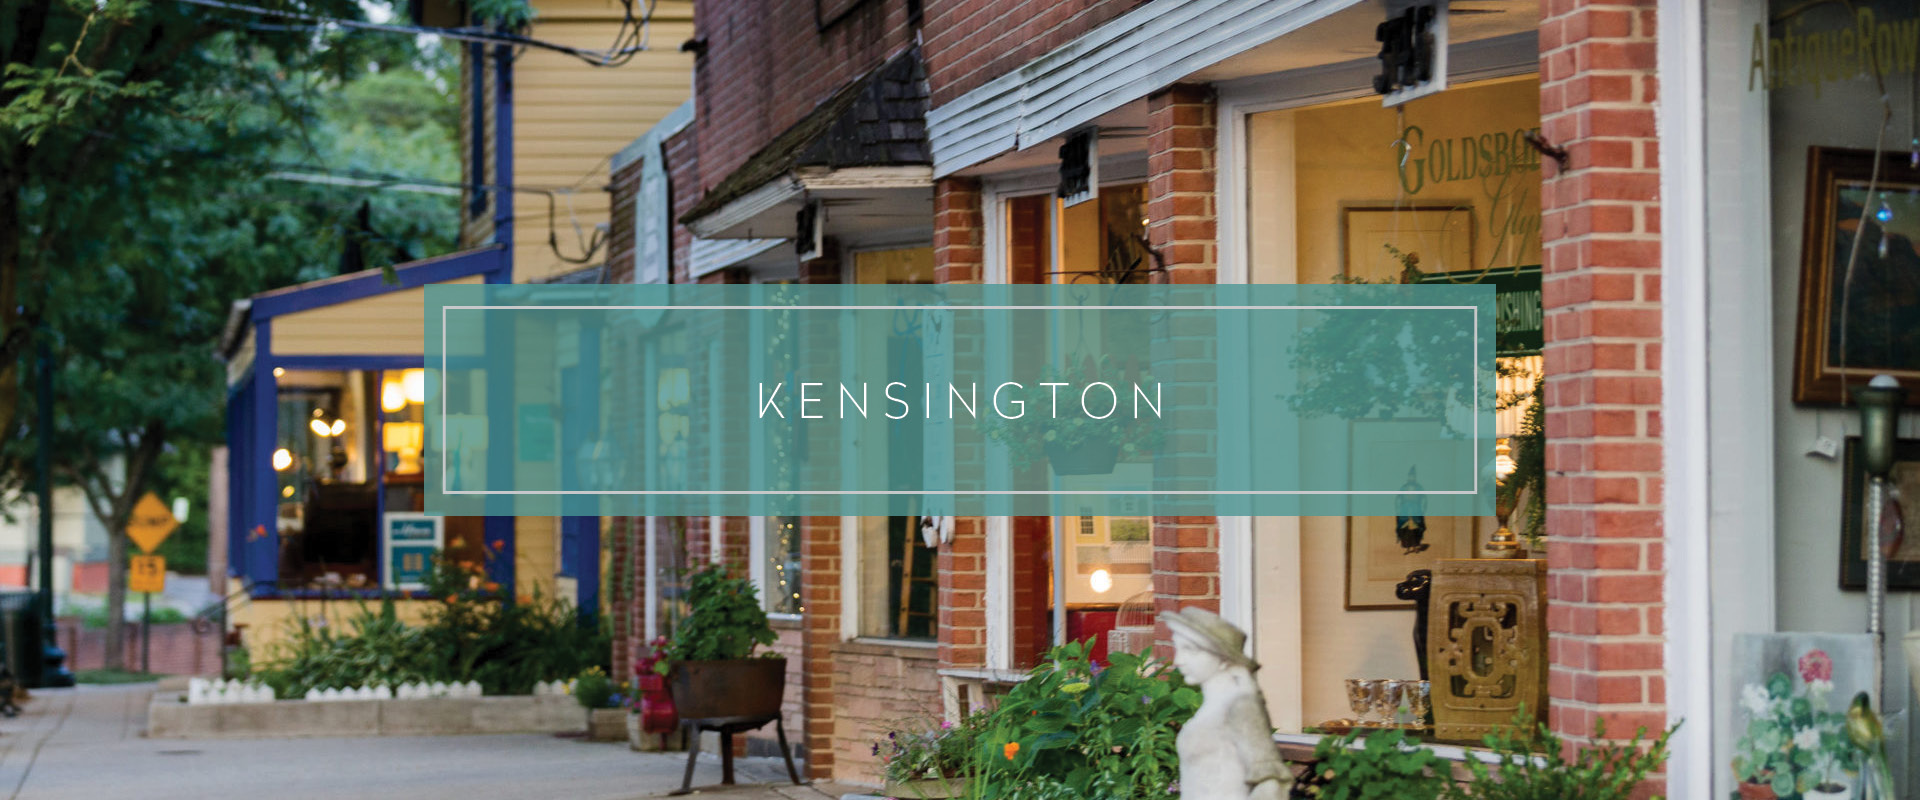 Kensington Homes for Sale